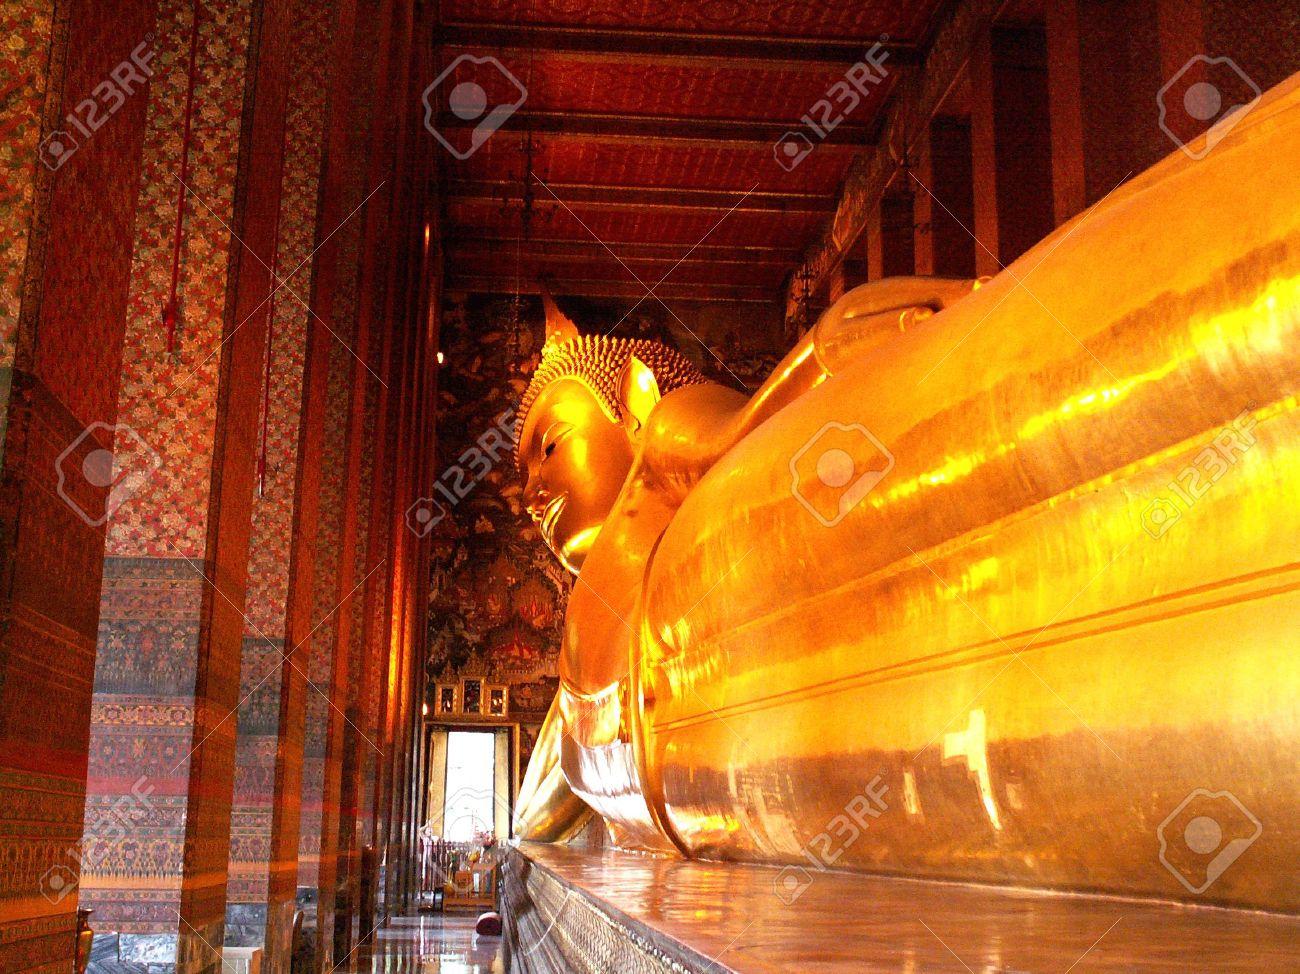 Temple of the Reclining Buddha (Wat Pho) Bangkok Stock Photo - 4897604 & Temple Of The Reclining Buddha (Wat Pho) Bangkok Stock Photo ... islam-shia.org